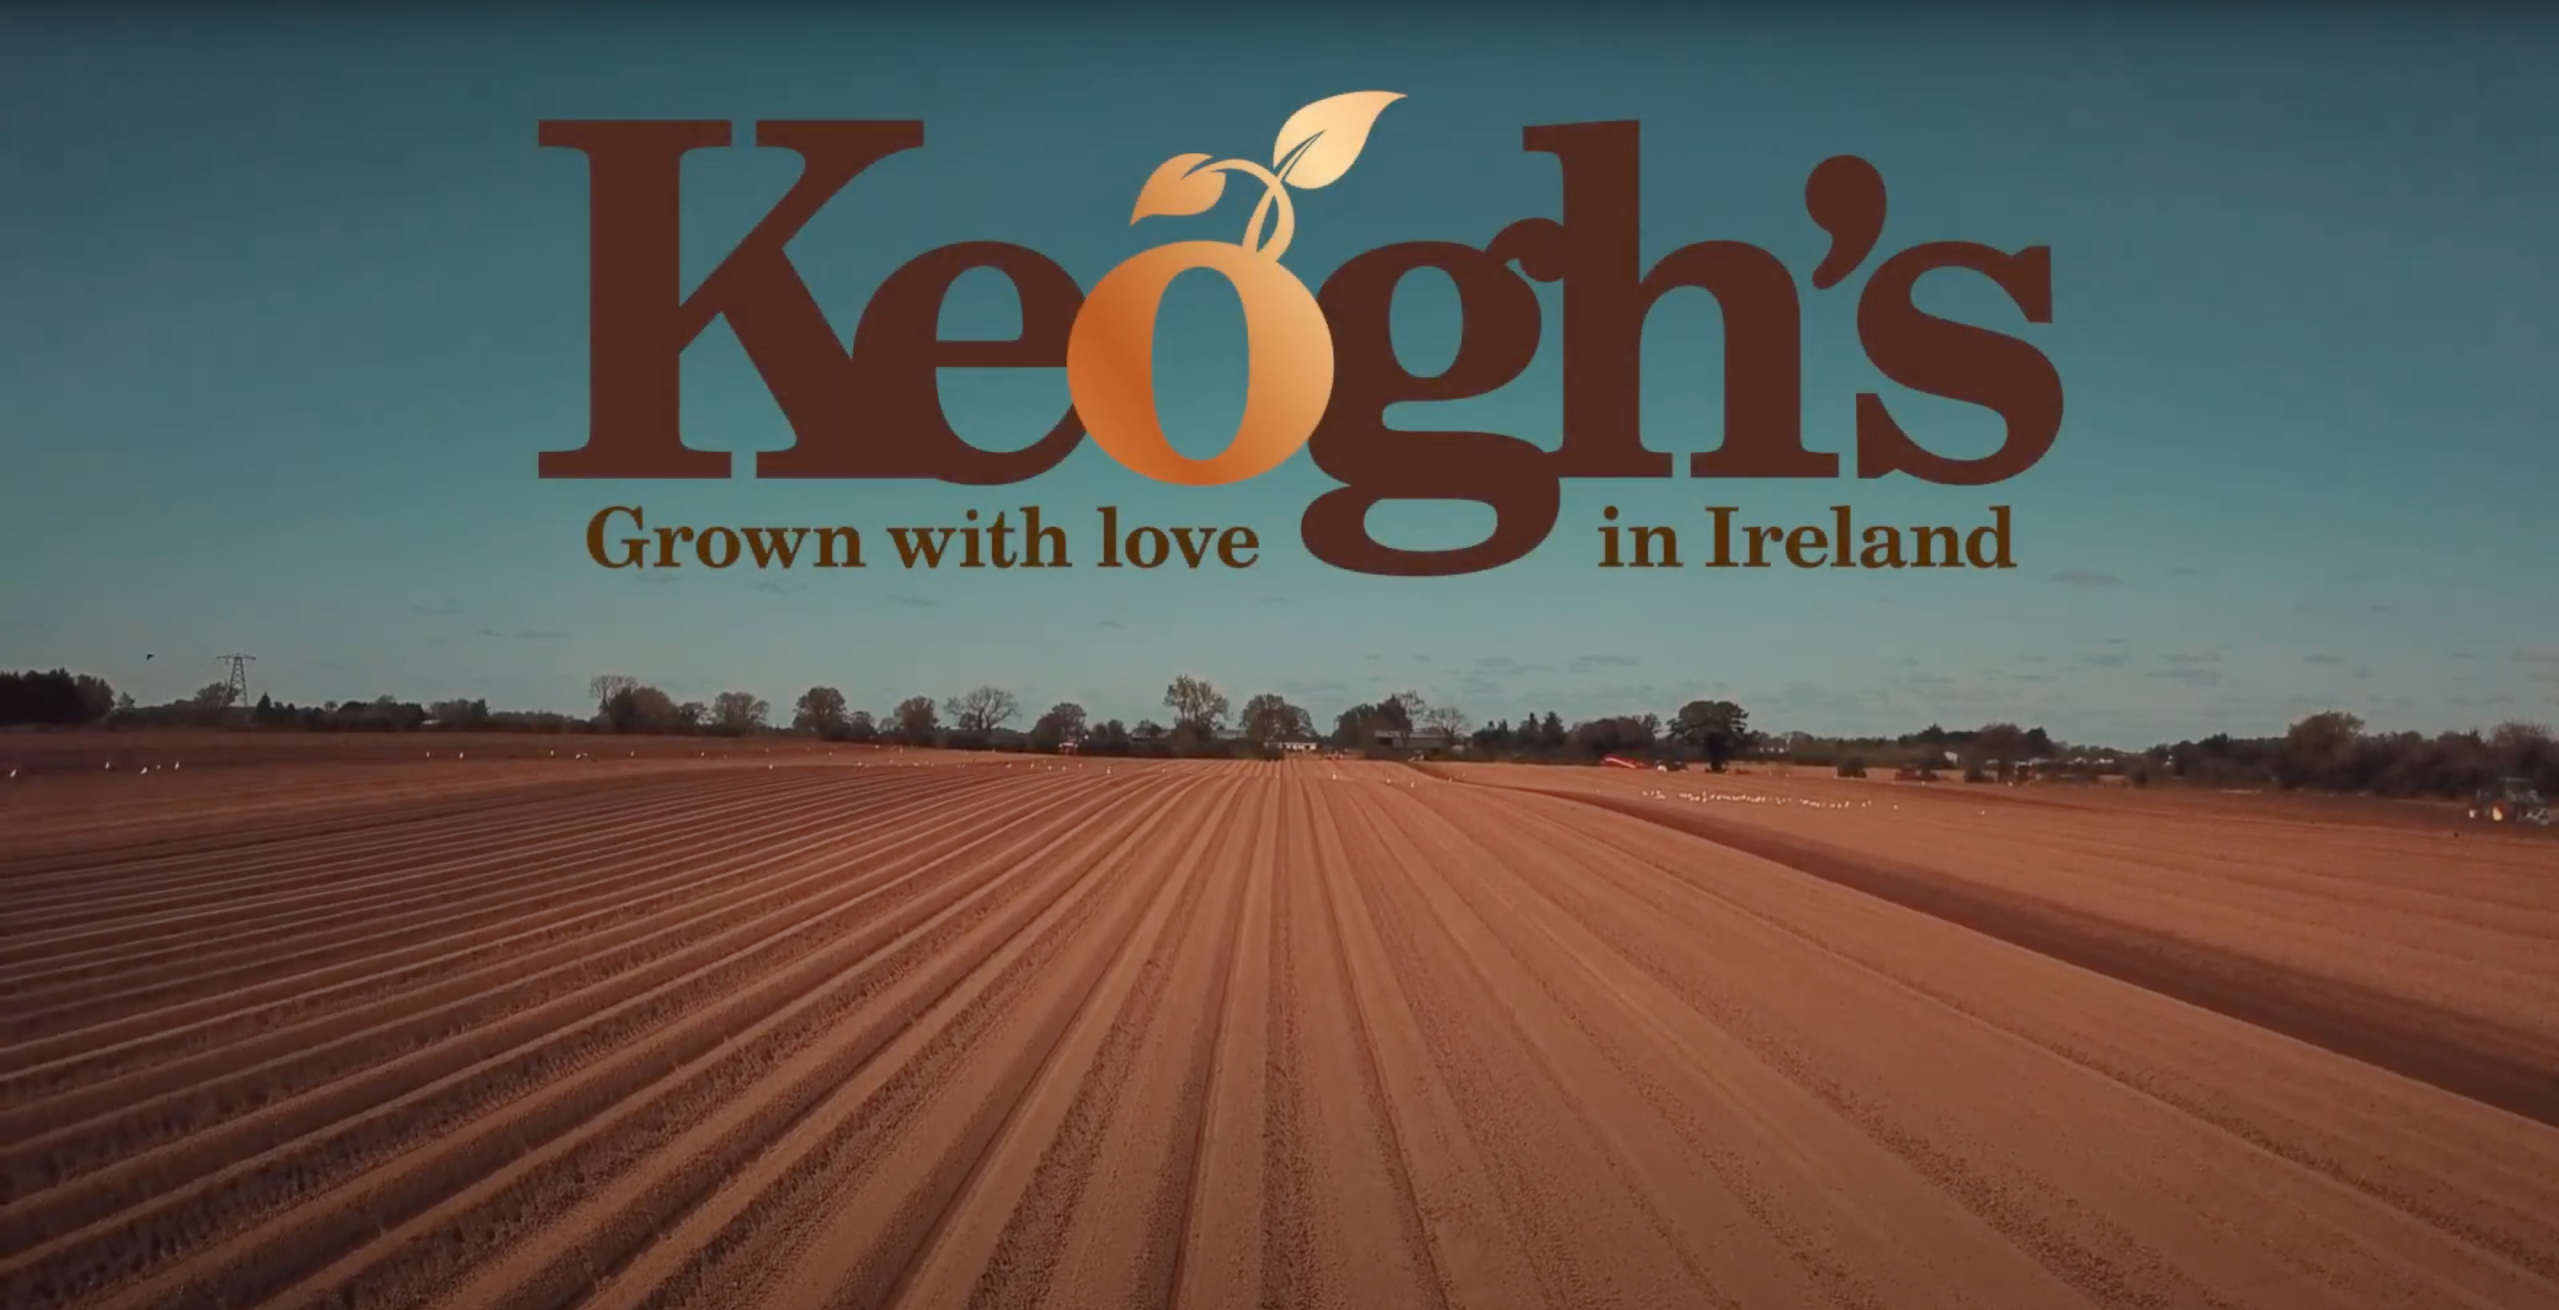 Keoghs Planting